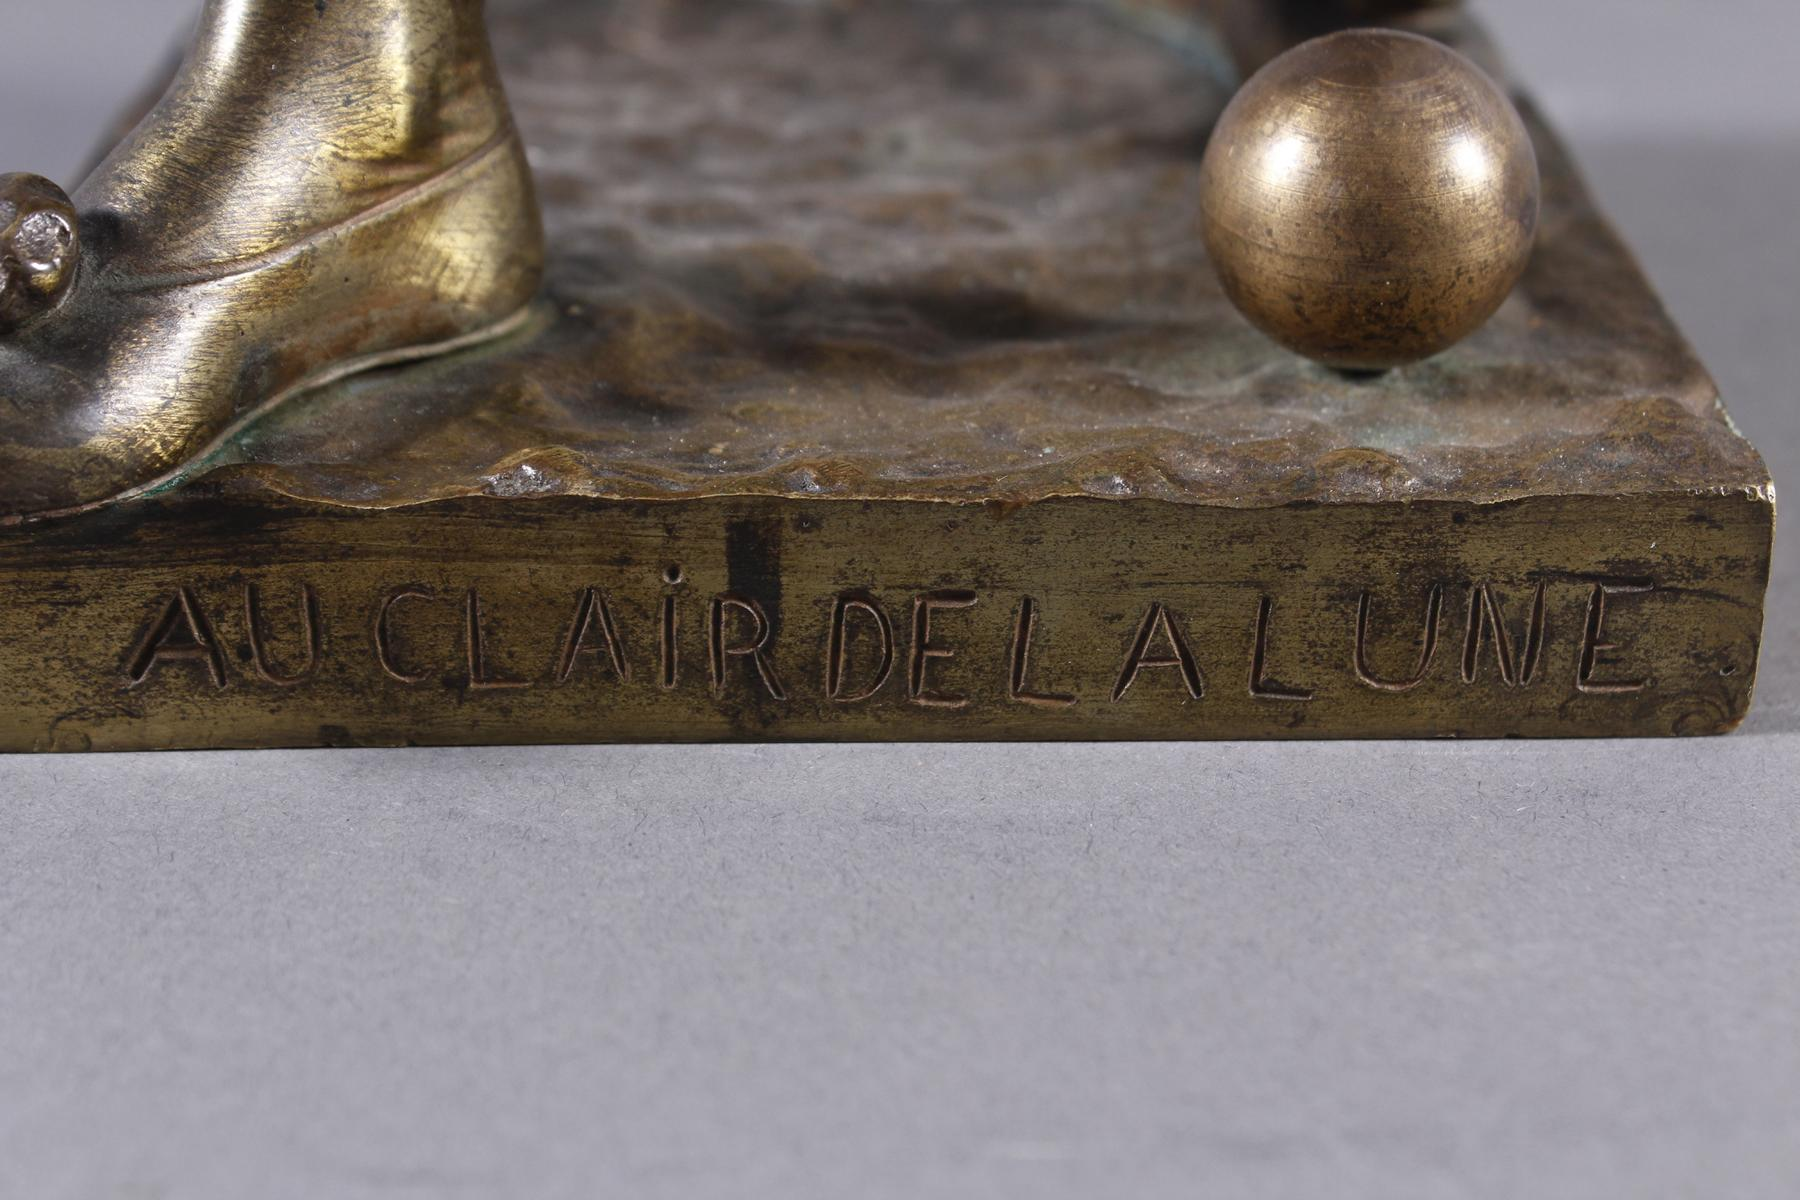 Eutrope Bouret (1833-1906), Bronzeskulptur 'Au claire de la Lune' um 1890/1900-7